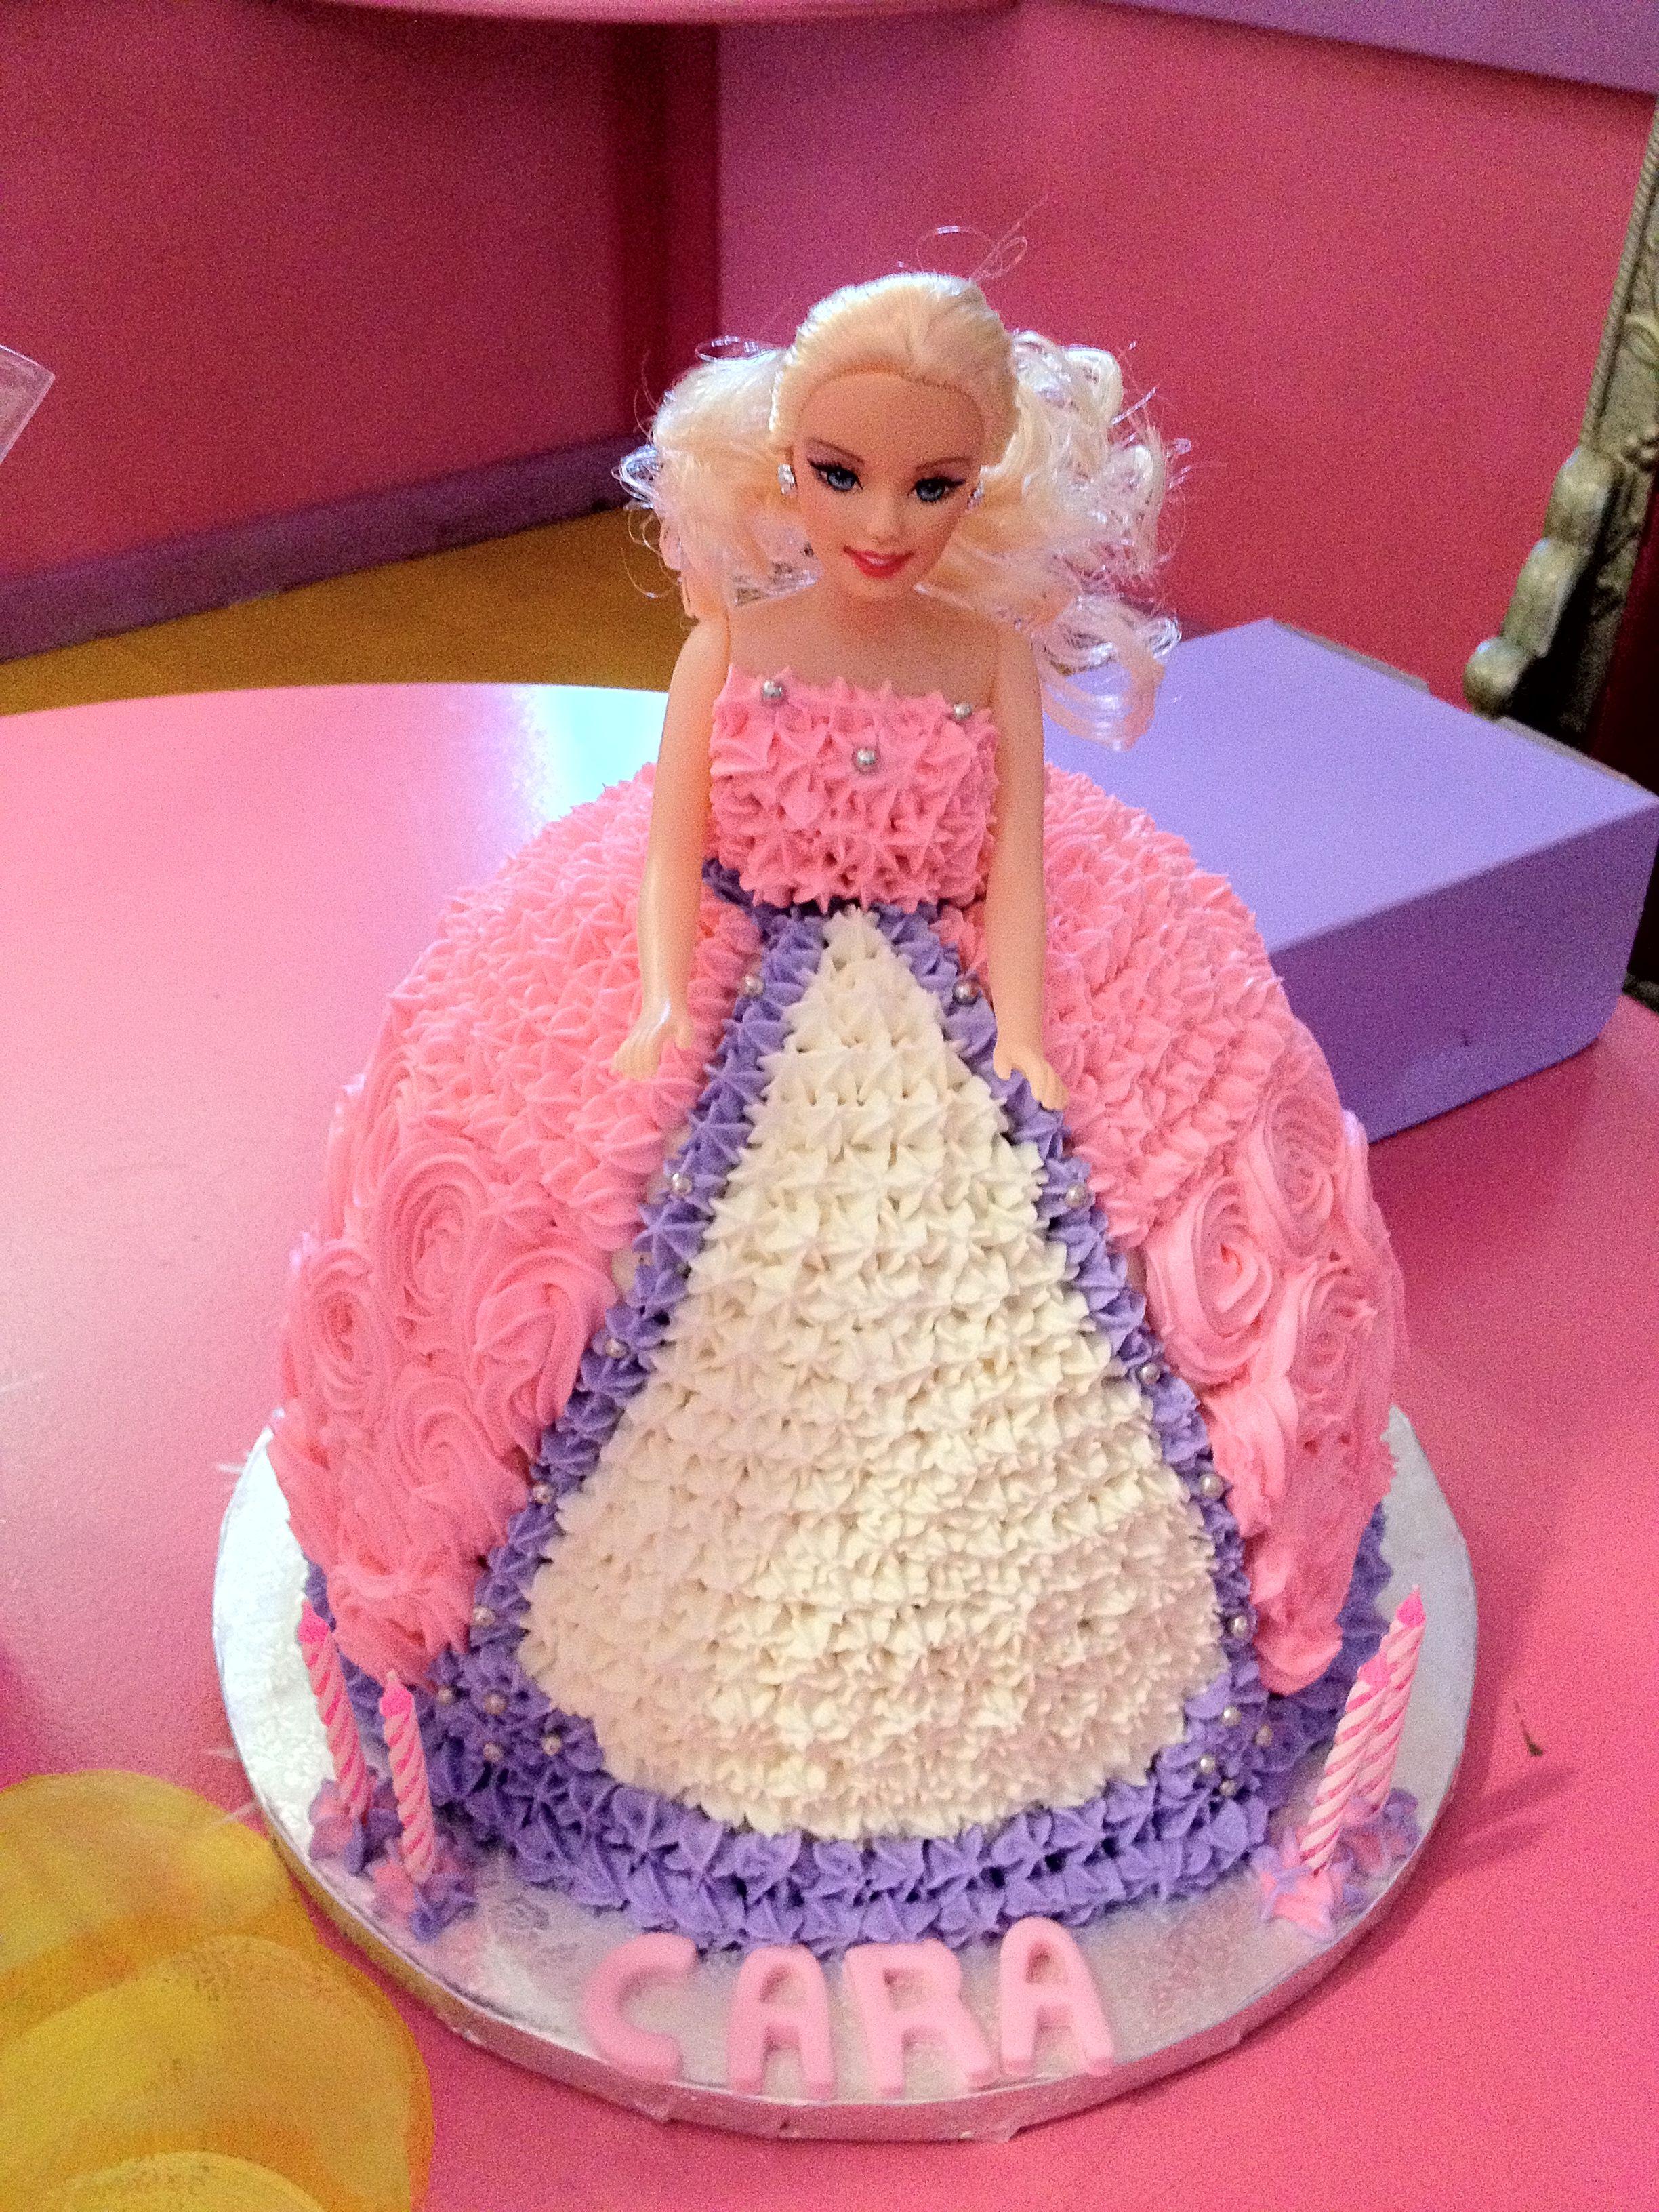 Cakes Barbie Kids party decor Bugzplaypark Cape Town Haileys